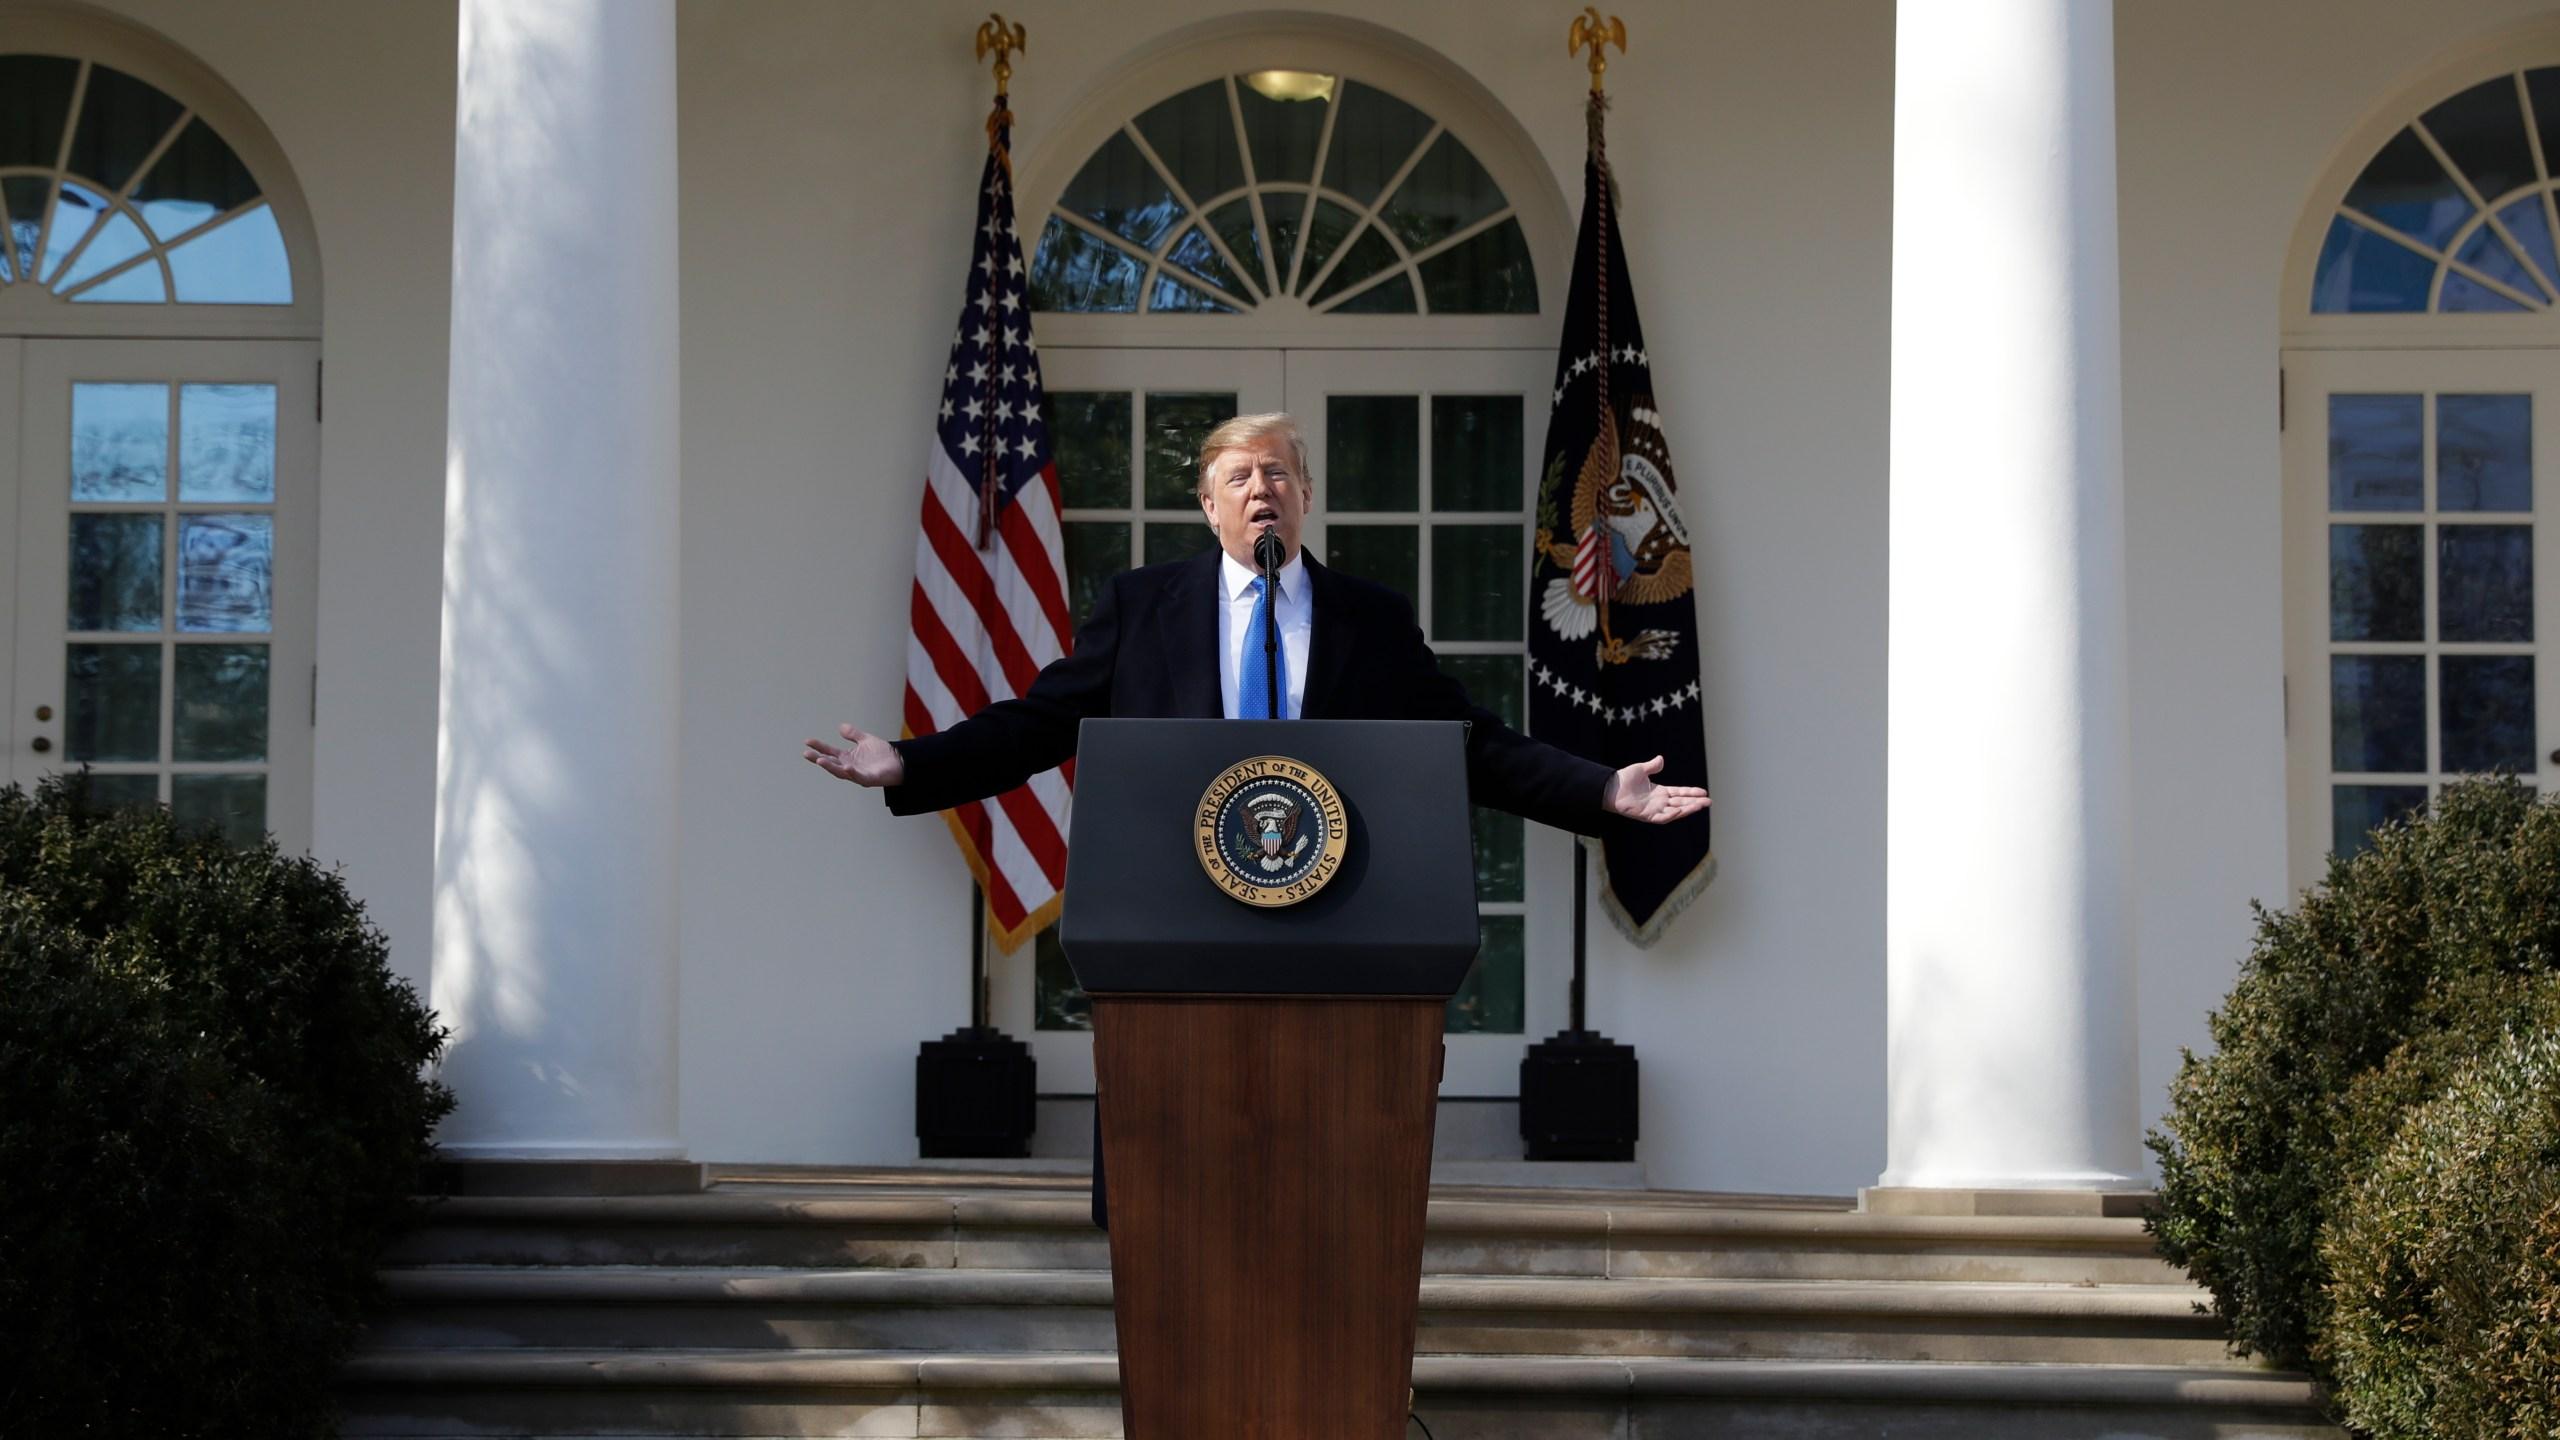 APTOPIX_Trump_Border_Security_07890-159532.jpg35214413